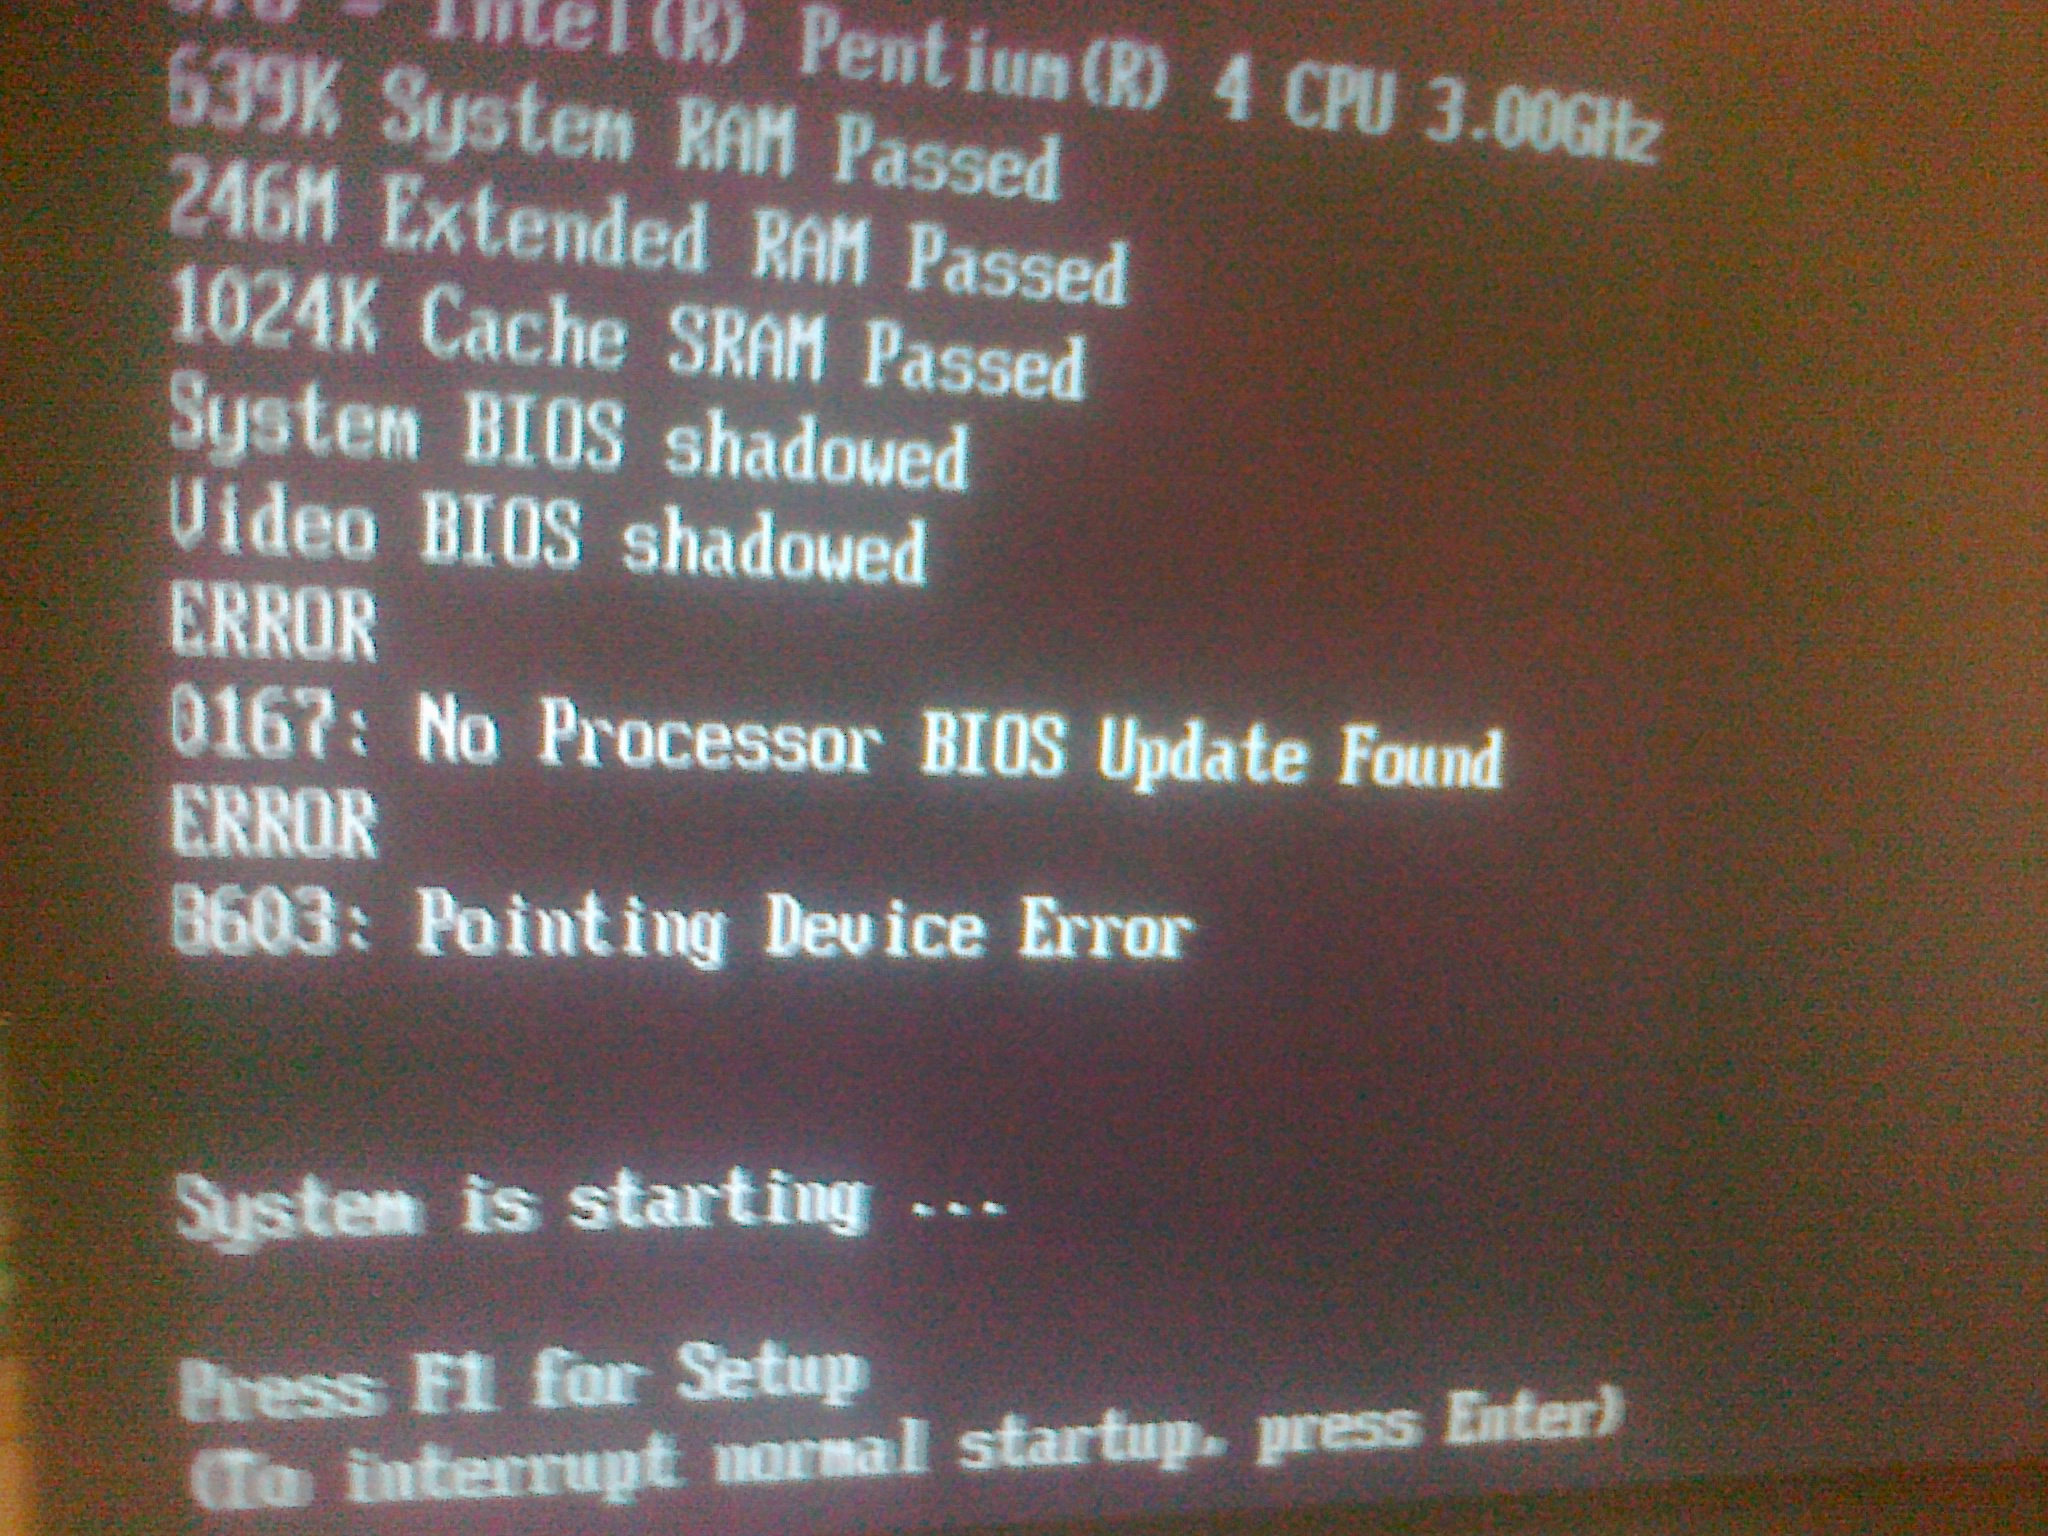 IBM BIOS 2akt40AUS flash. Wykonanie flasha BIOS-u.